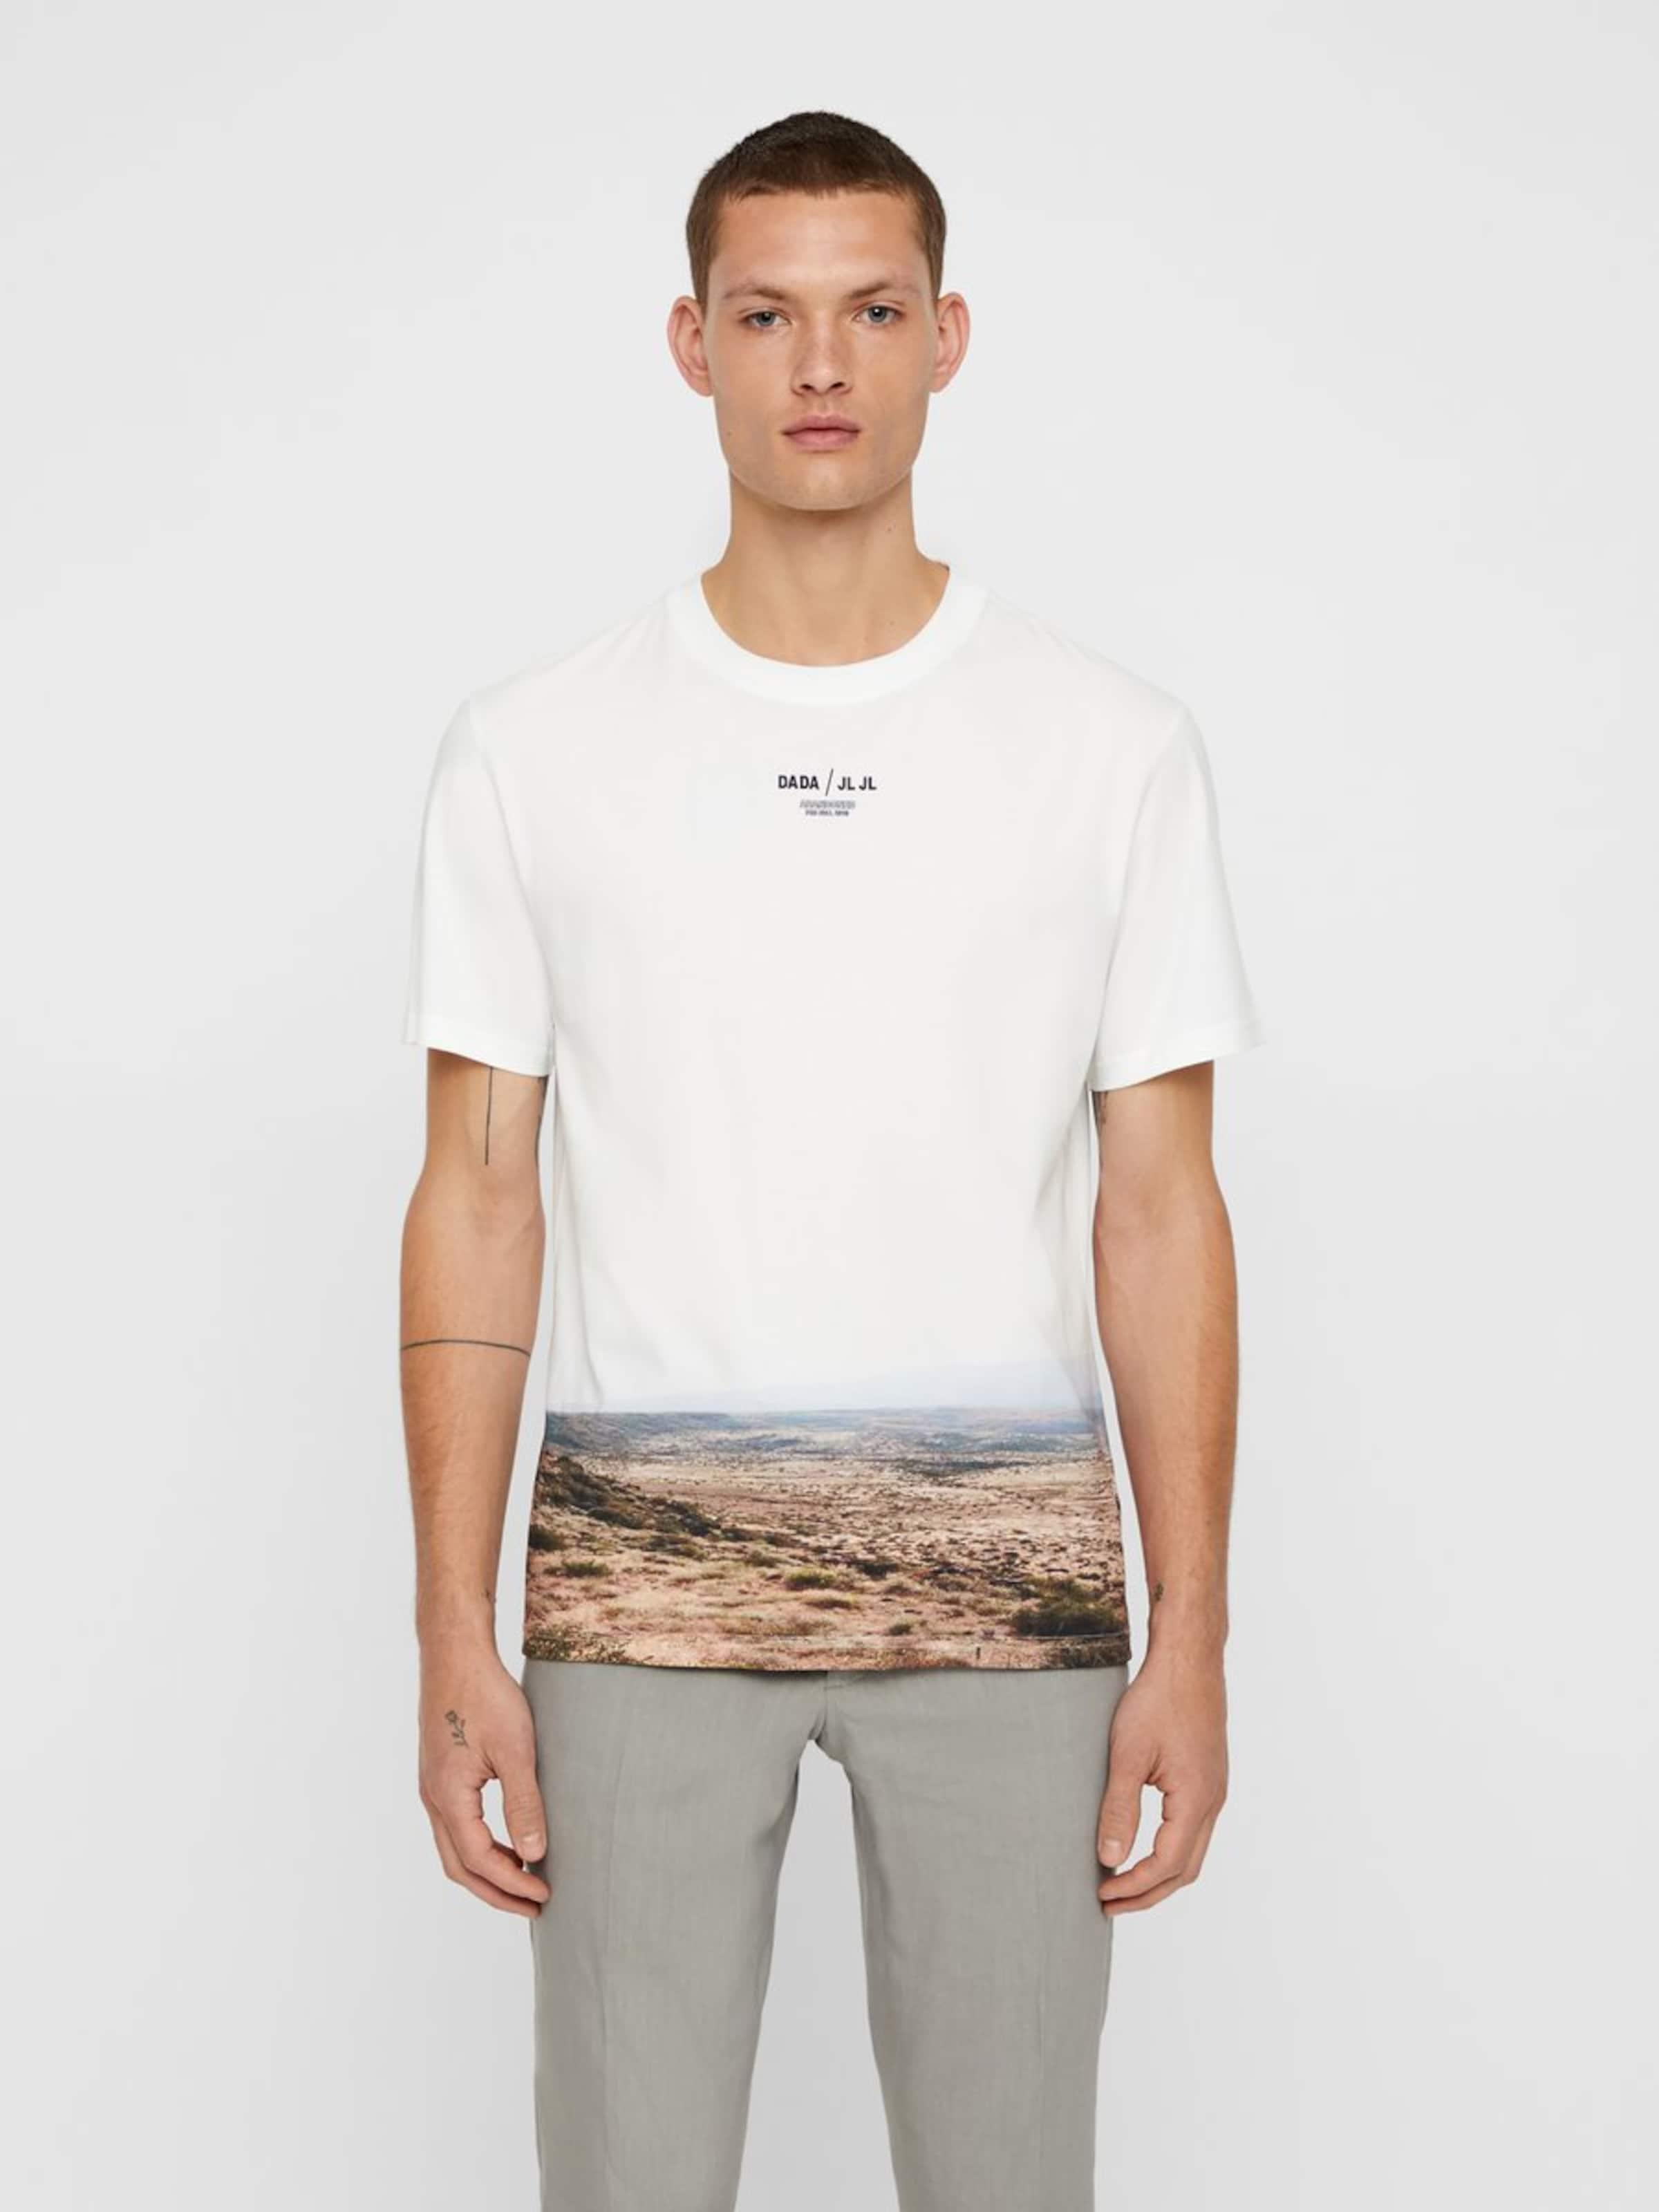 lindeberg 'jordan Cotton' shirt J T In Distinct Weiß trCdxQsh